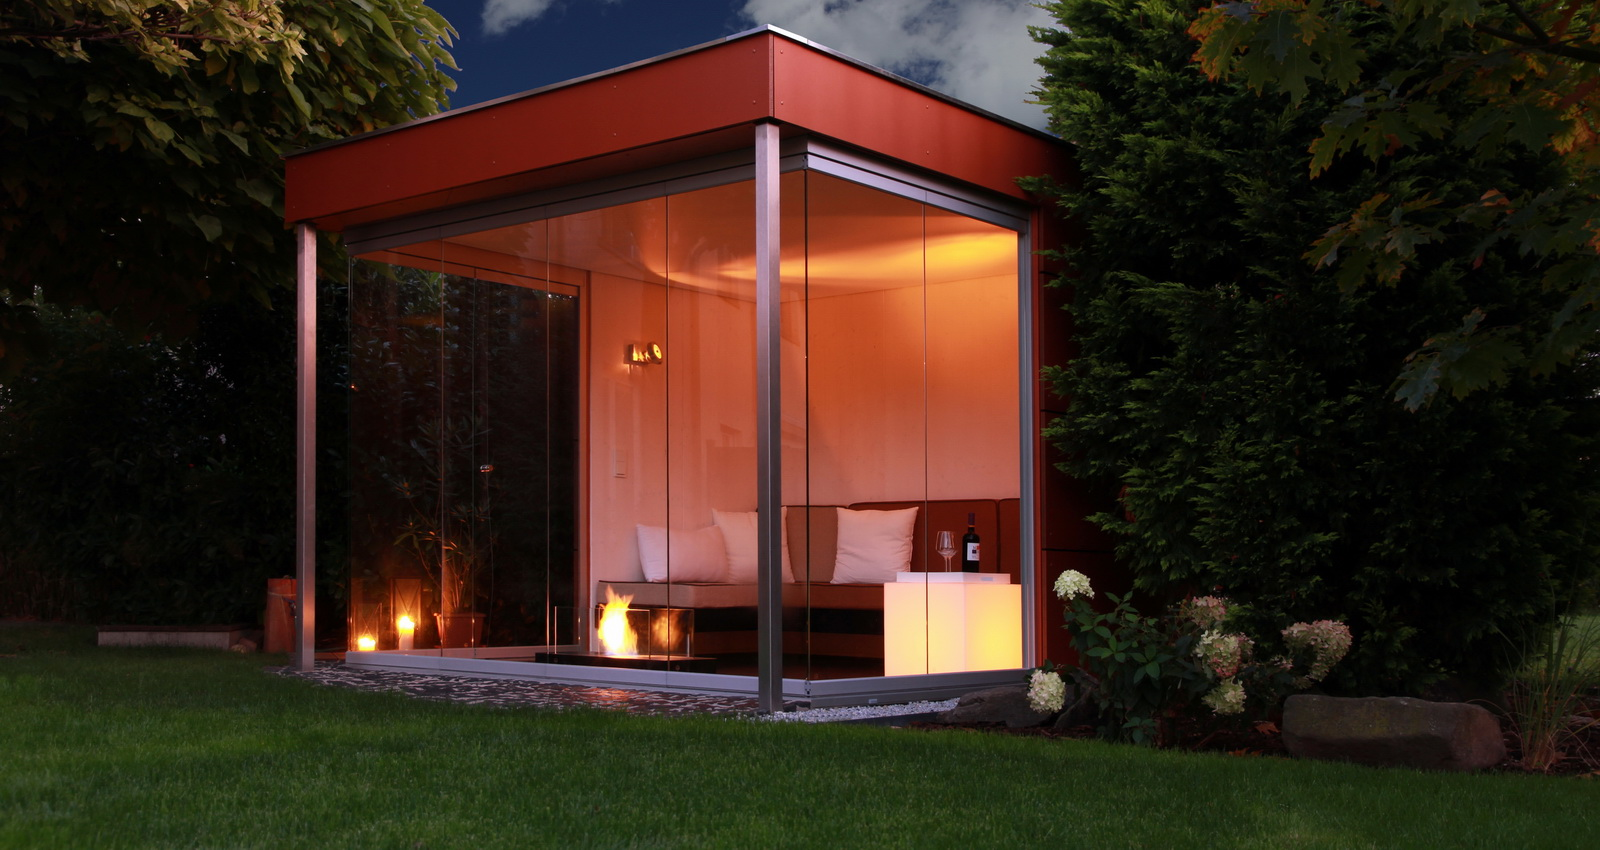 Wohnideen Gartenhaus stunning gartenhaus design modern contemporary best einrichtungs